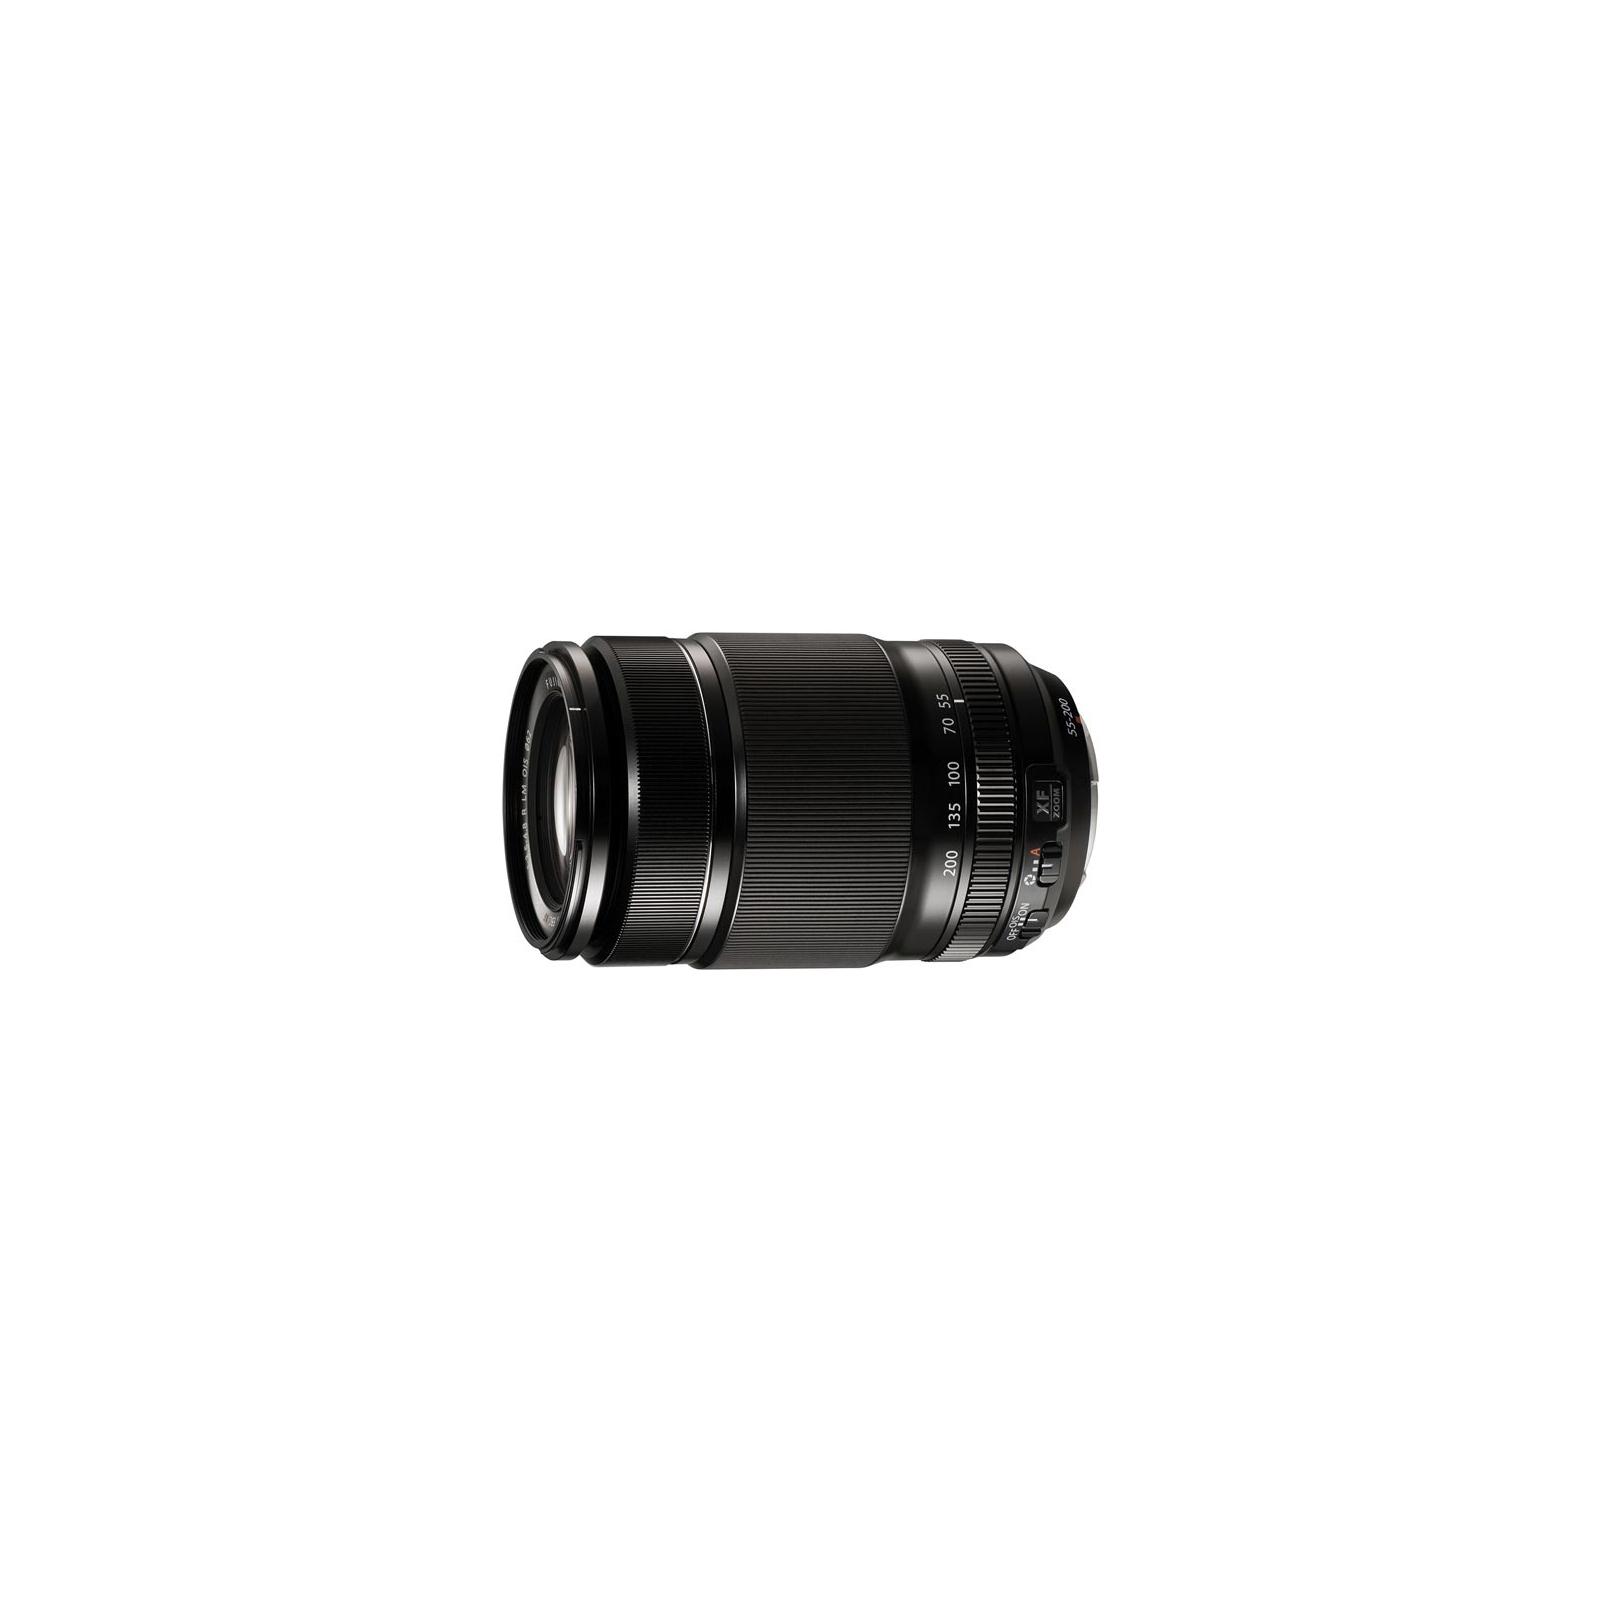 Объектив Fujifilm XF 55-200mm F3.5-4.8 OIS (16384941) изображение 2